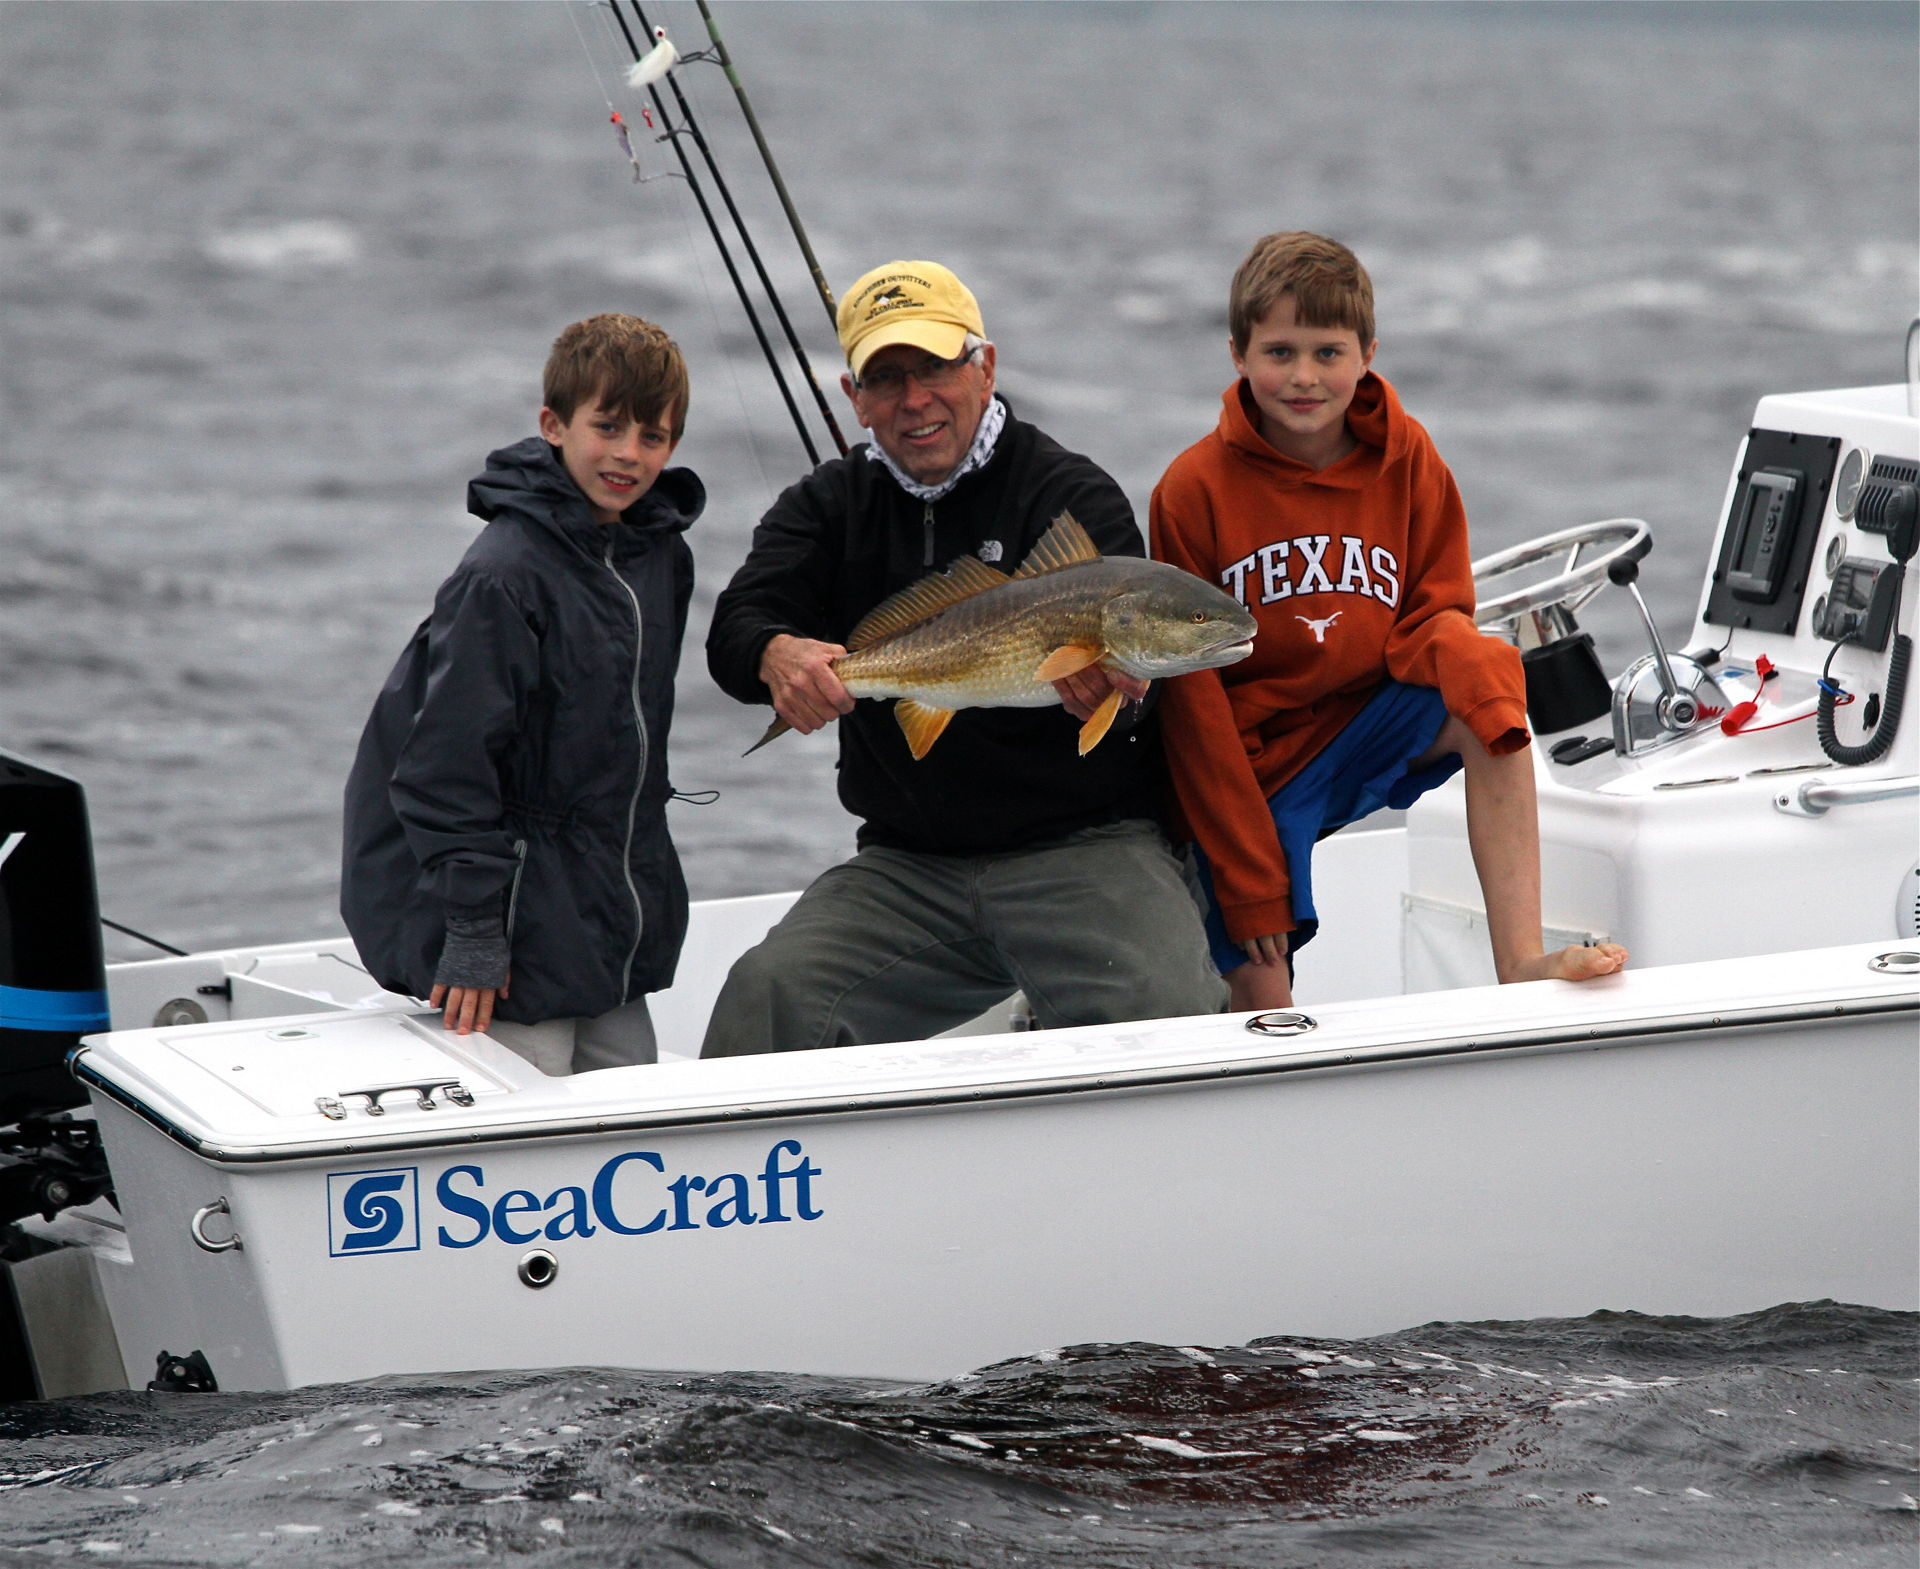 Panama city beach fishing charters swe for Panama city fishing charters